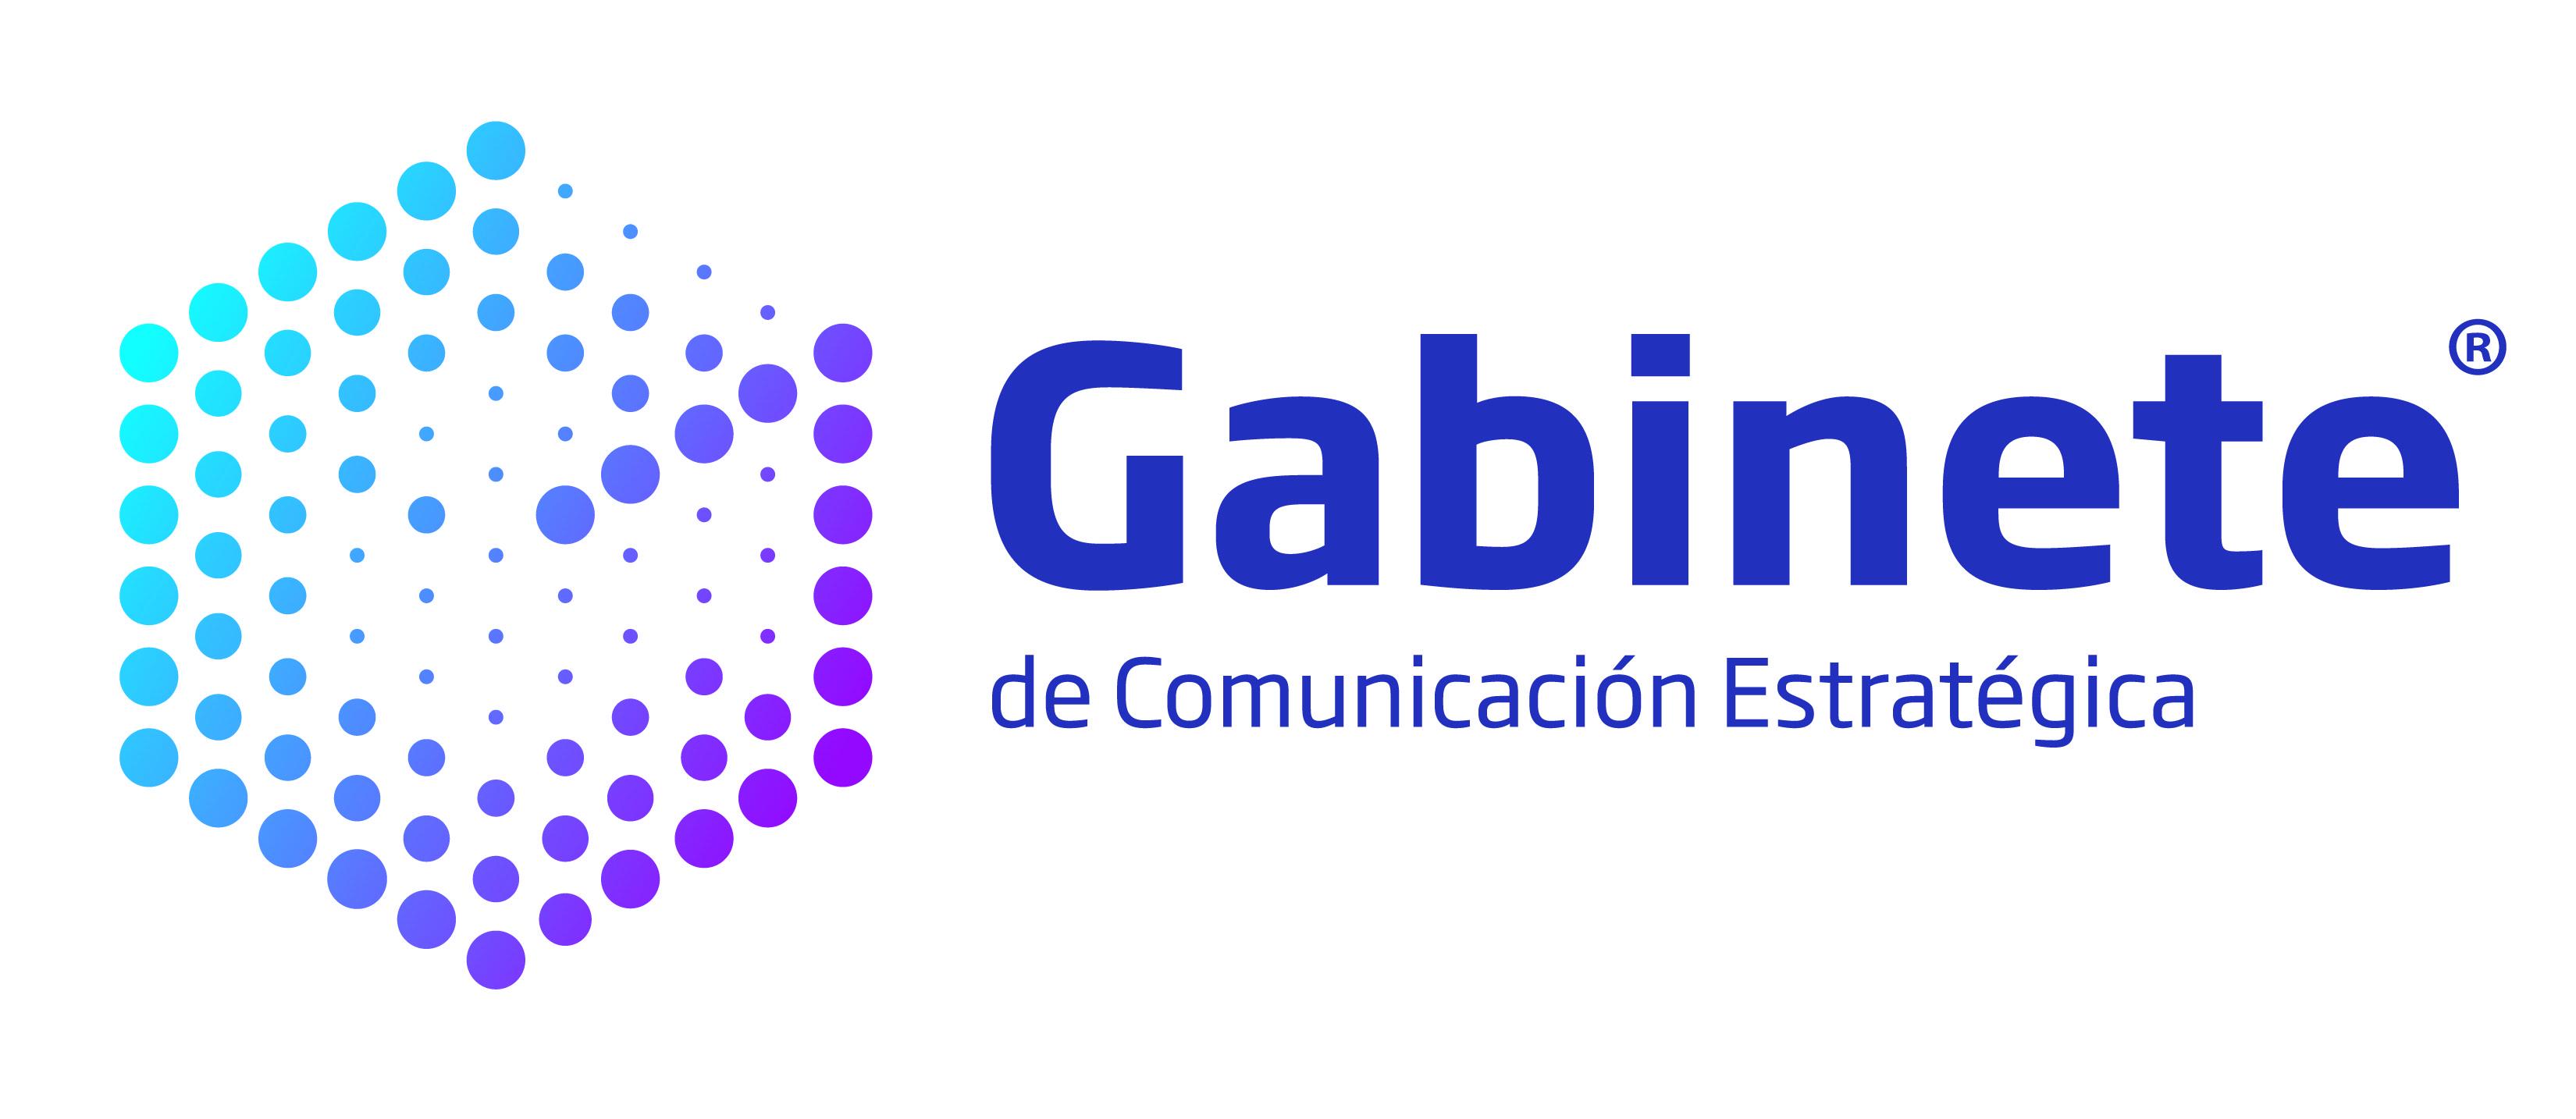 Gabinete de Comunicacion Estrategica Logo photo - 1